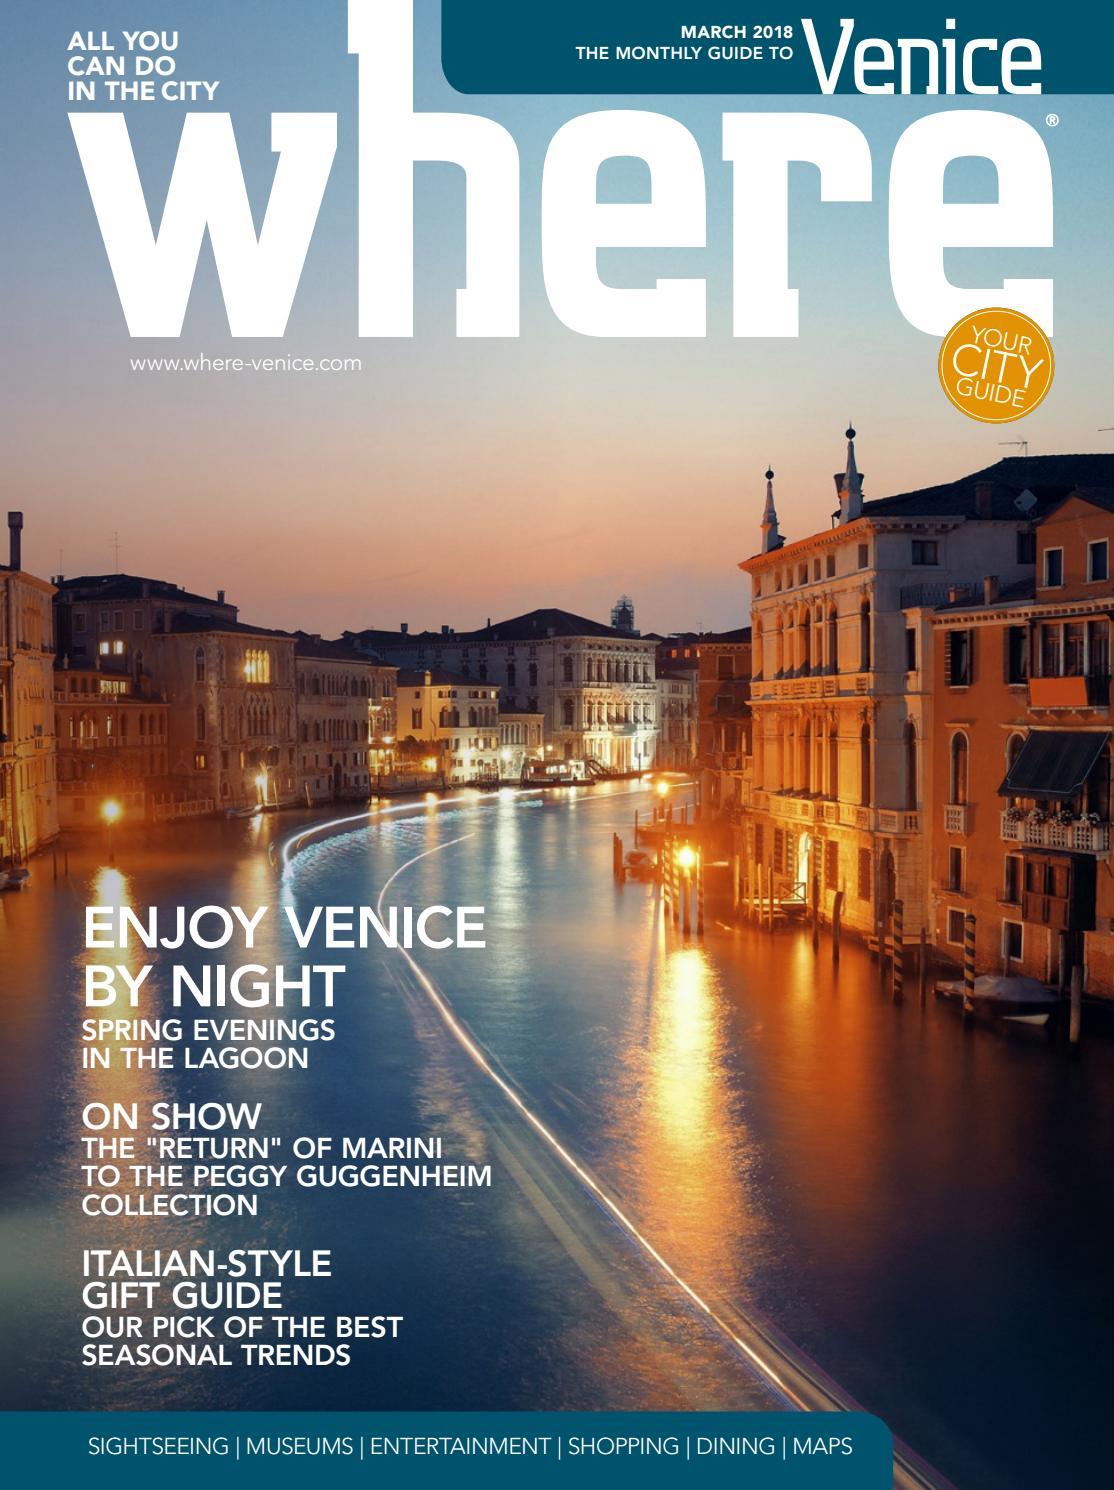 Vincenzo Rinaldi Nova Milanese where venice n 19 march 2018 by where italia - issuu